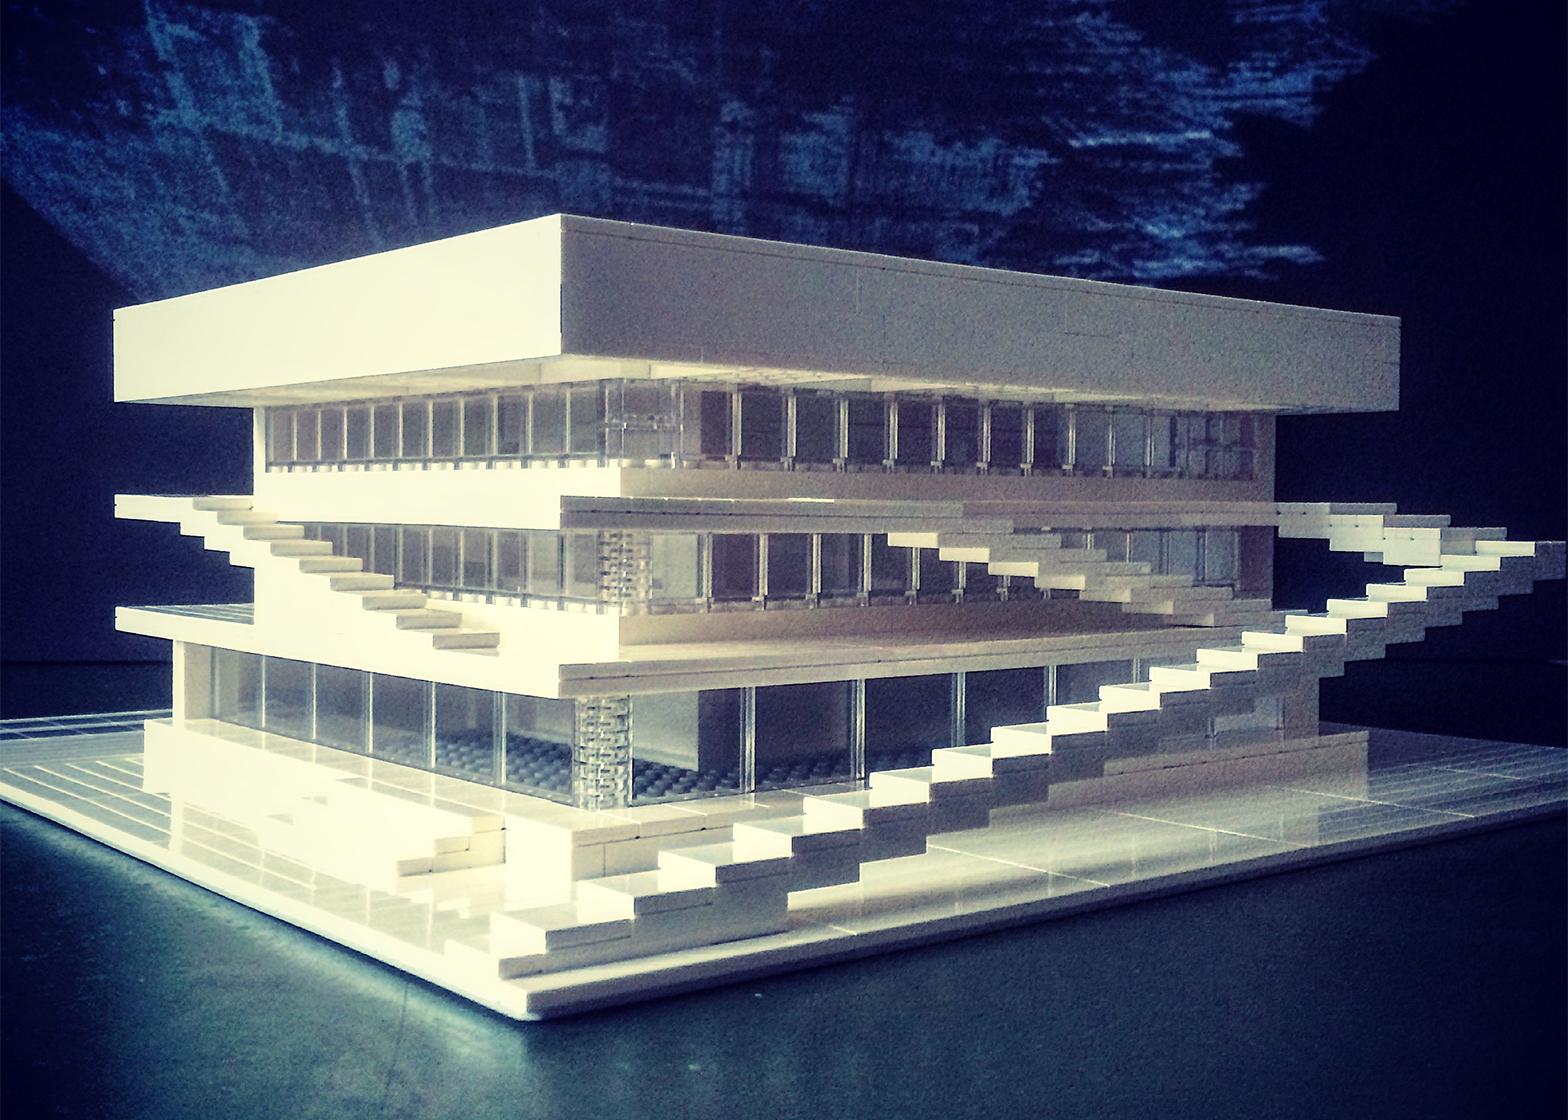 Lego_tonic by Arndt Schlaudraff